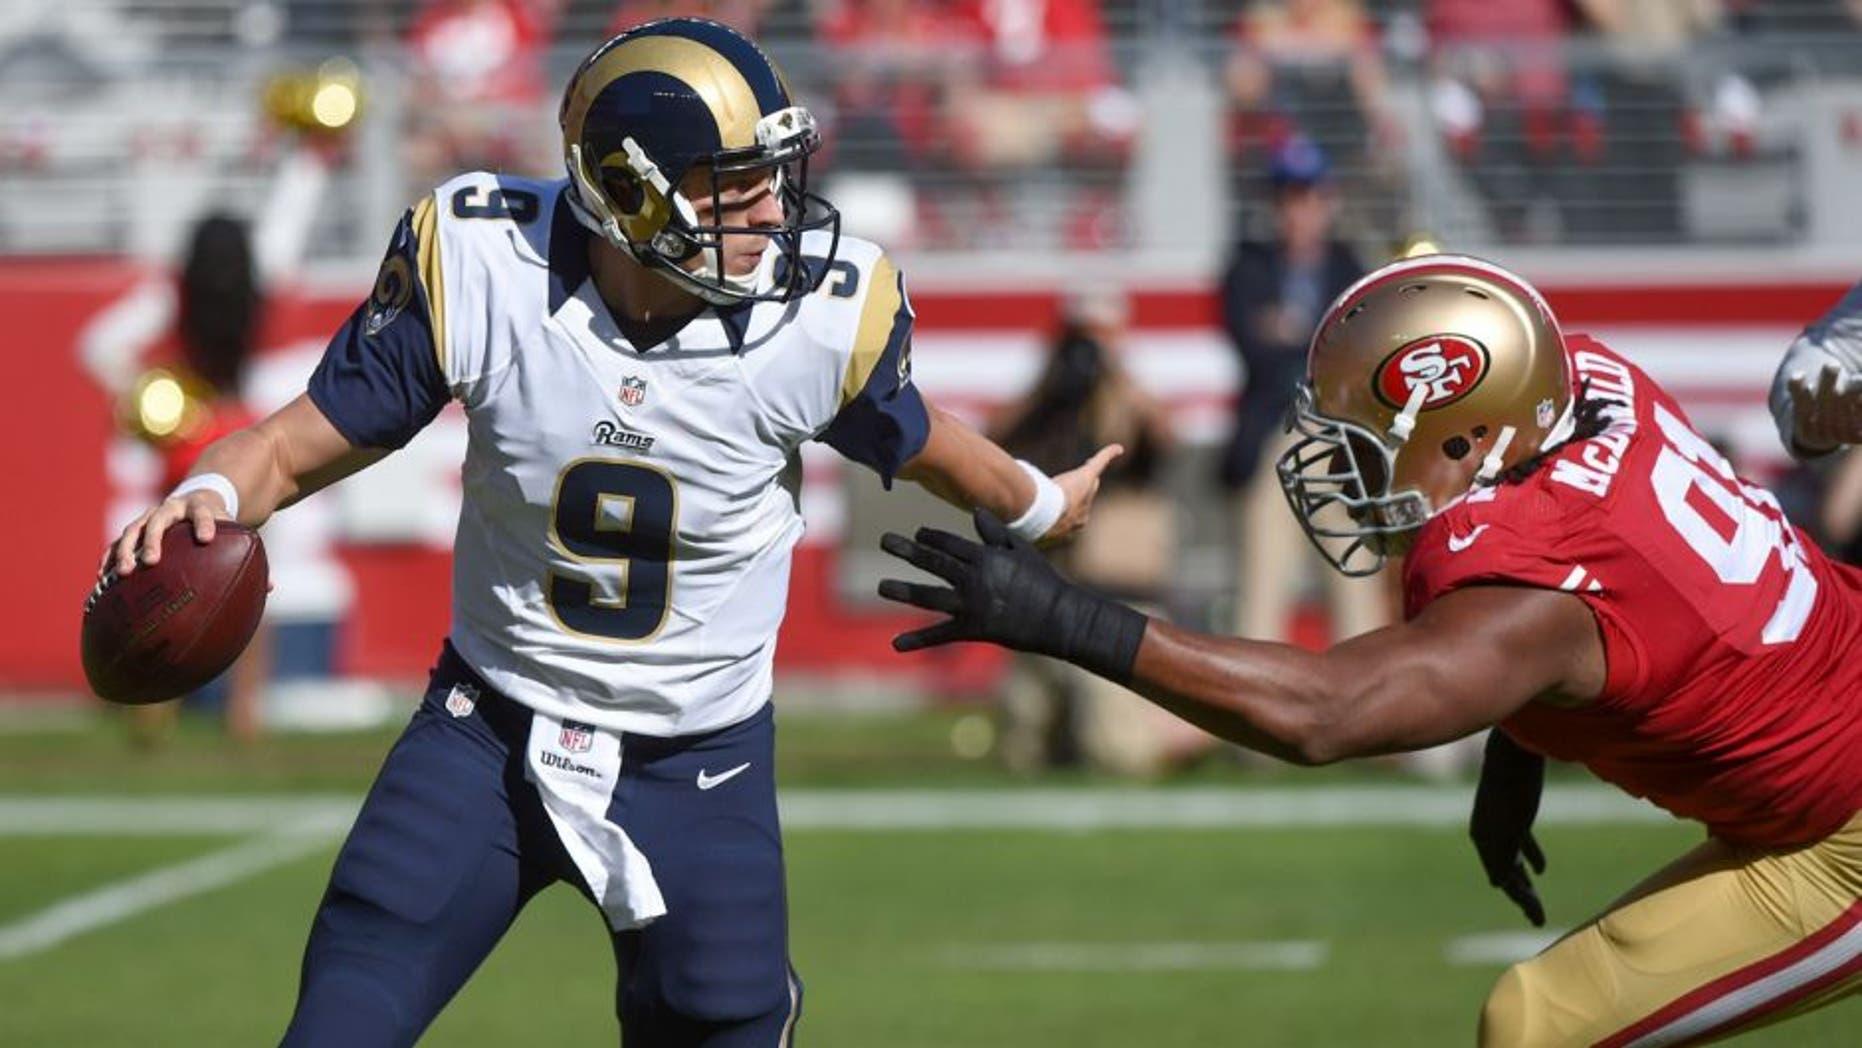 November 2, 2014; Santa Clara, CA, USA; St. Louis Rams quarterback Austin Davis (9) scrambles from San Francisco 49ers defensive end Ray McDonald (91) during the first quarter at Levi's Stadium. Mandatory Credit: Kyle Terada-USA TODAY Sports